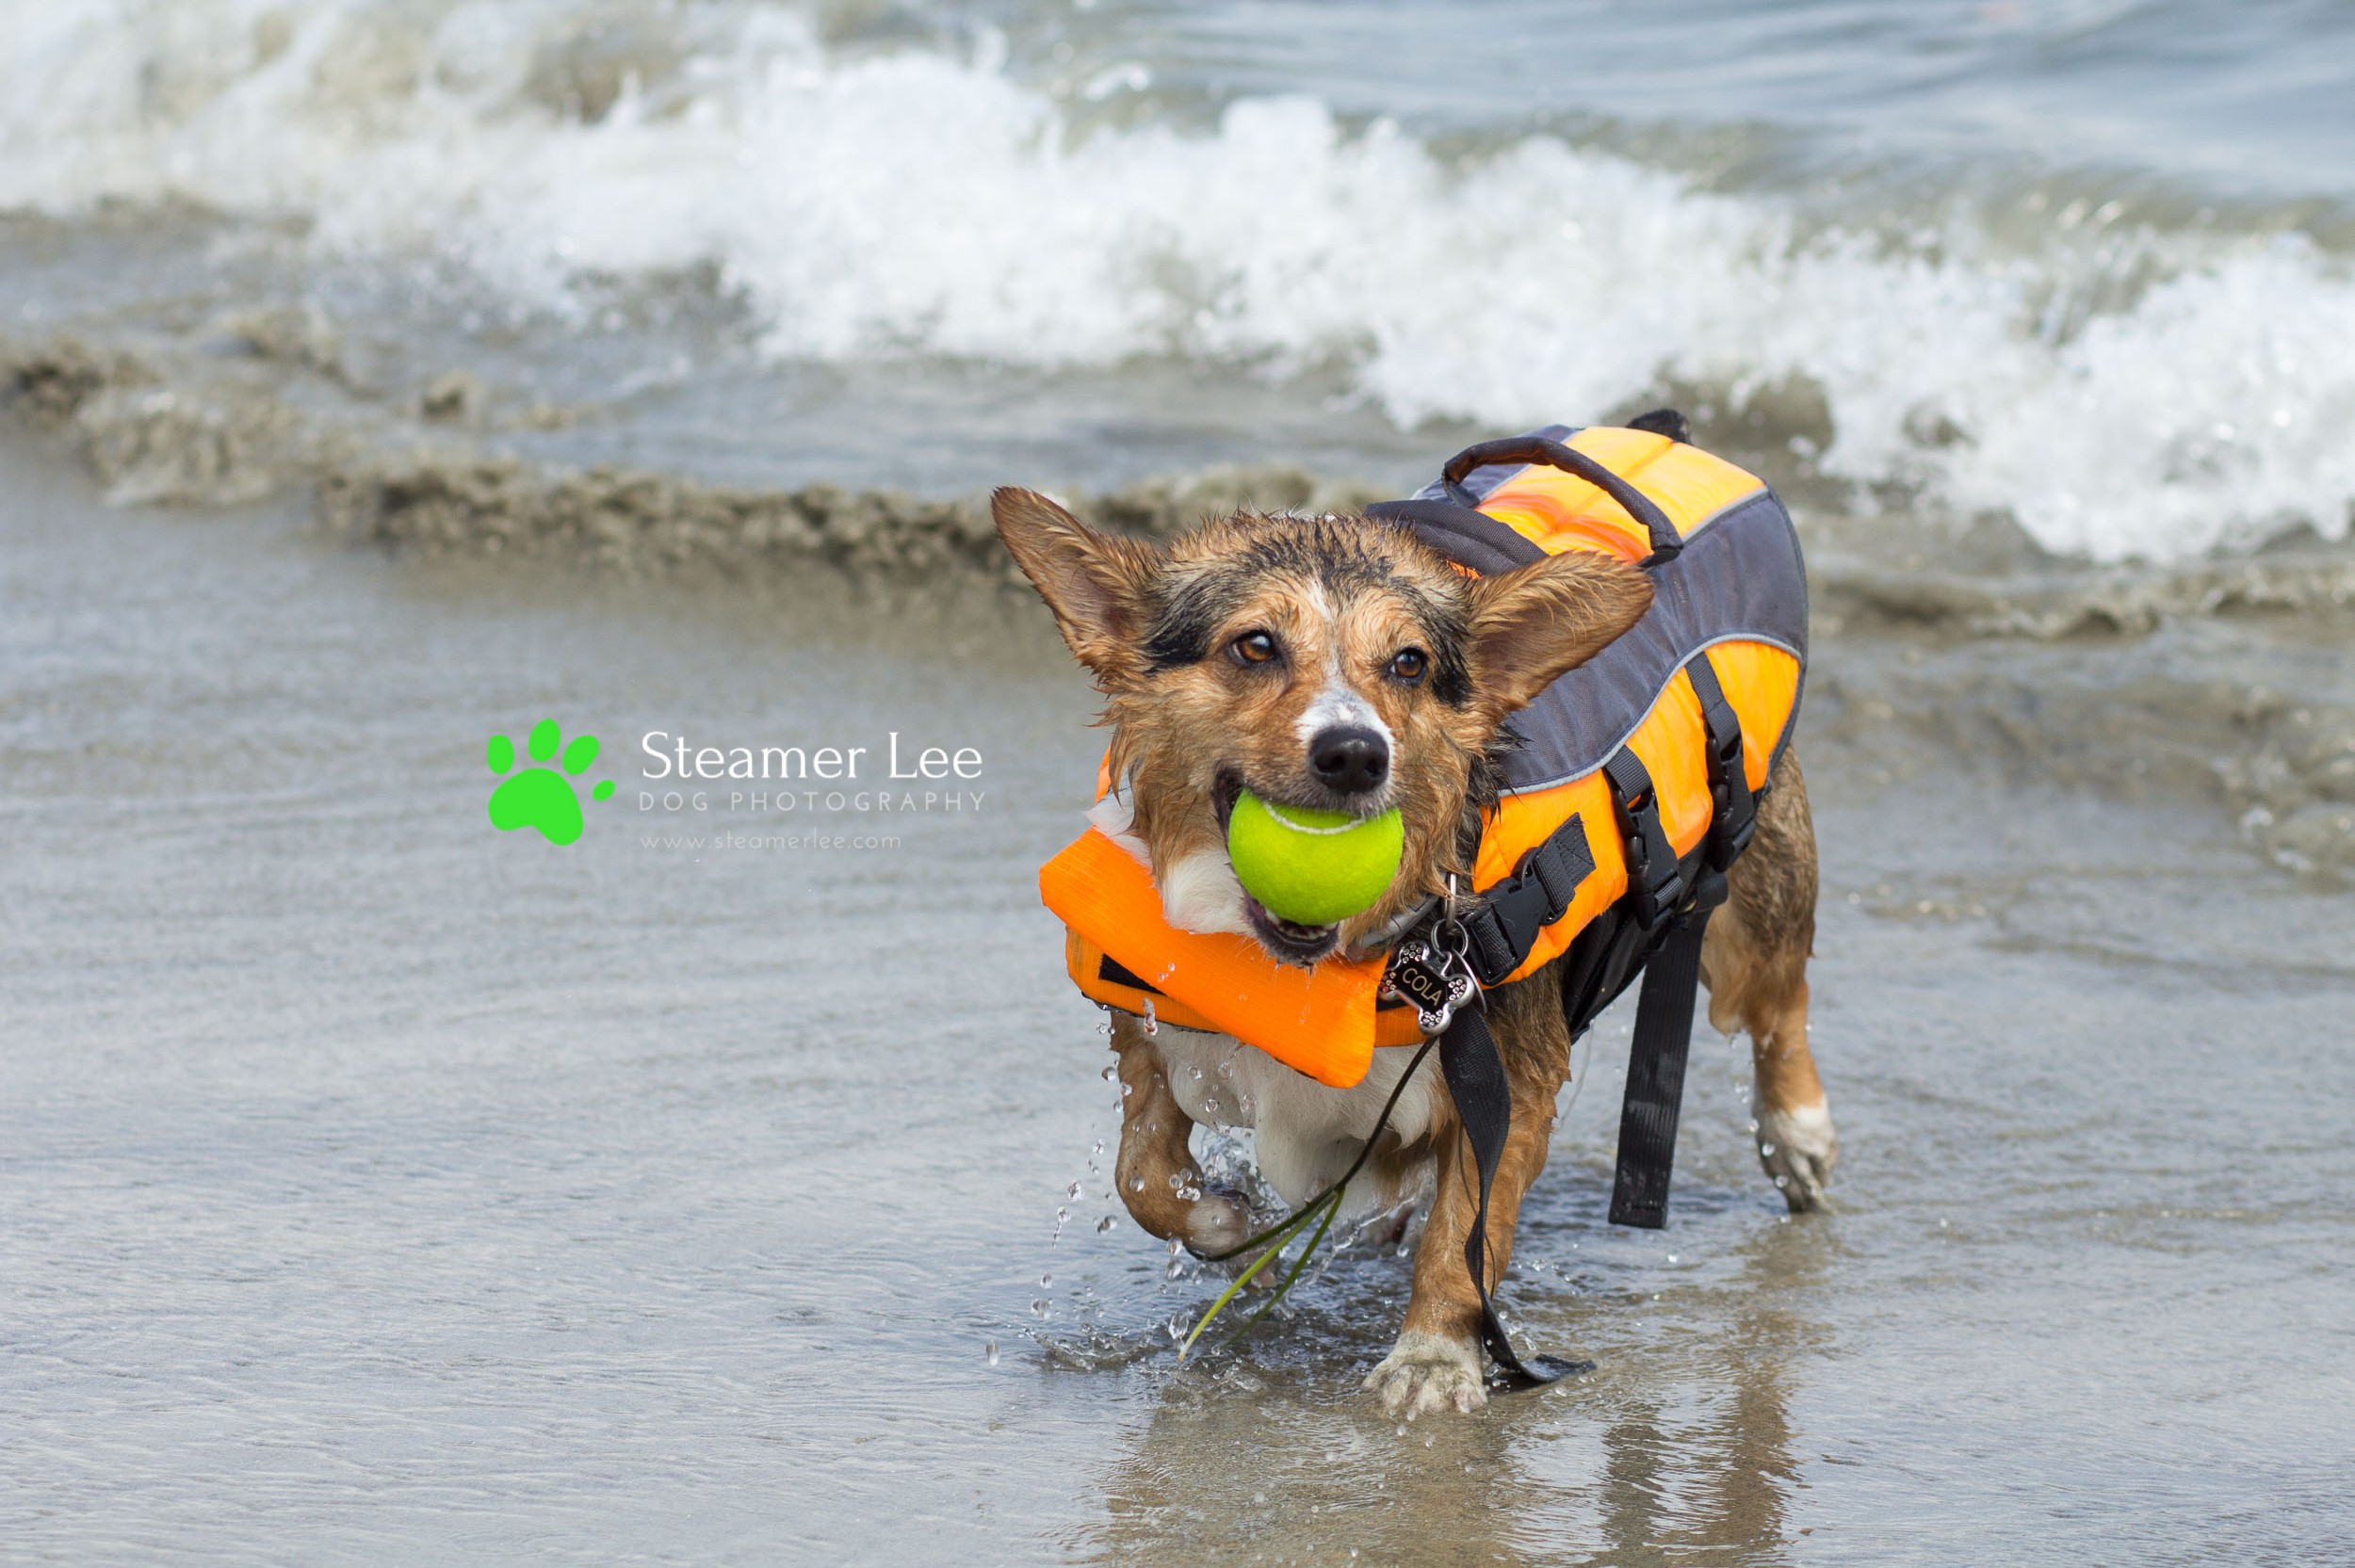 Steamer Lee Dog Photography - July 2017 So Cal Corgi Beach Day - Vol. 3 - 12.jpg